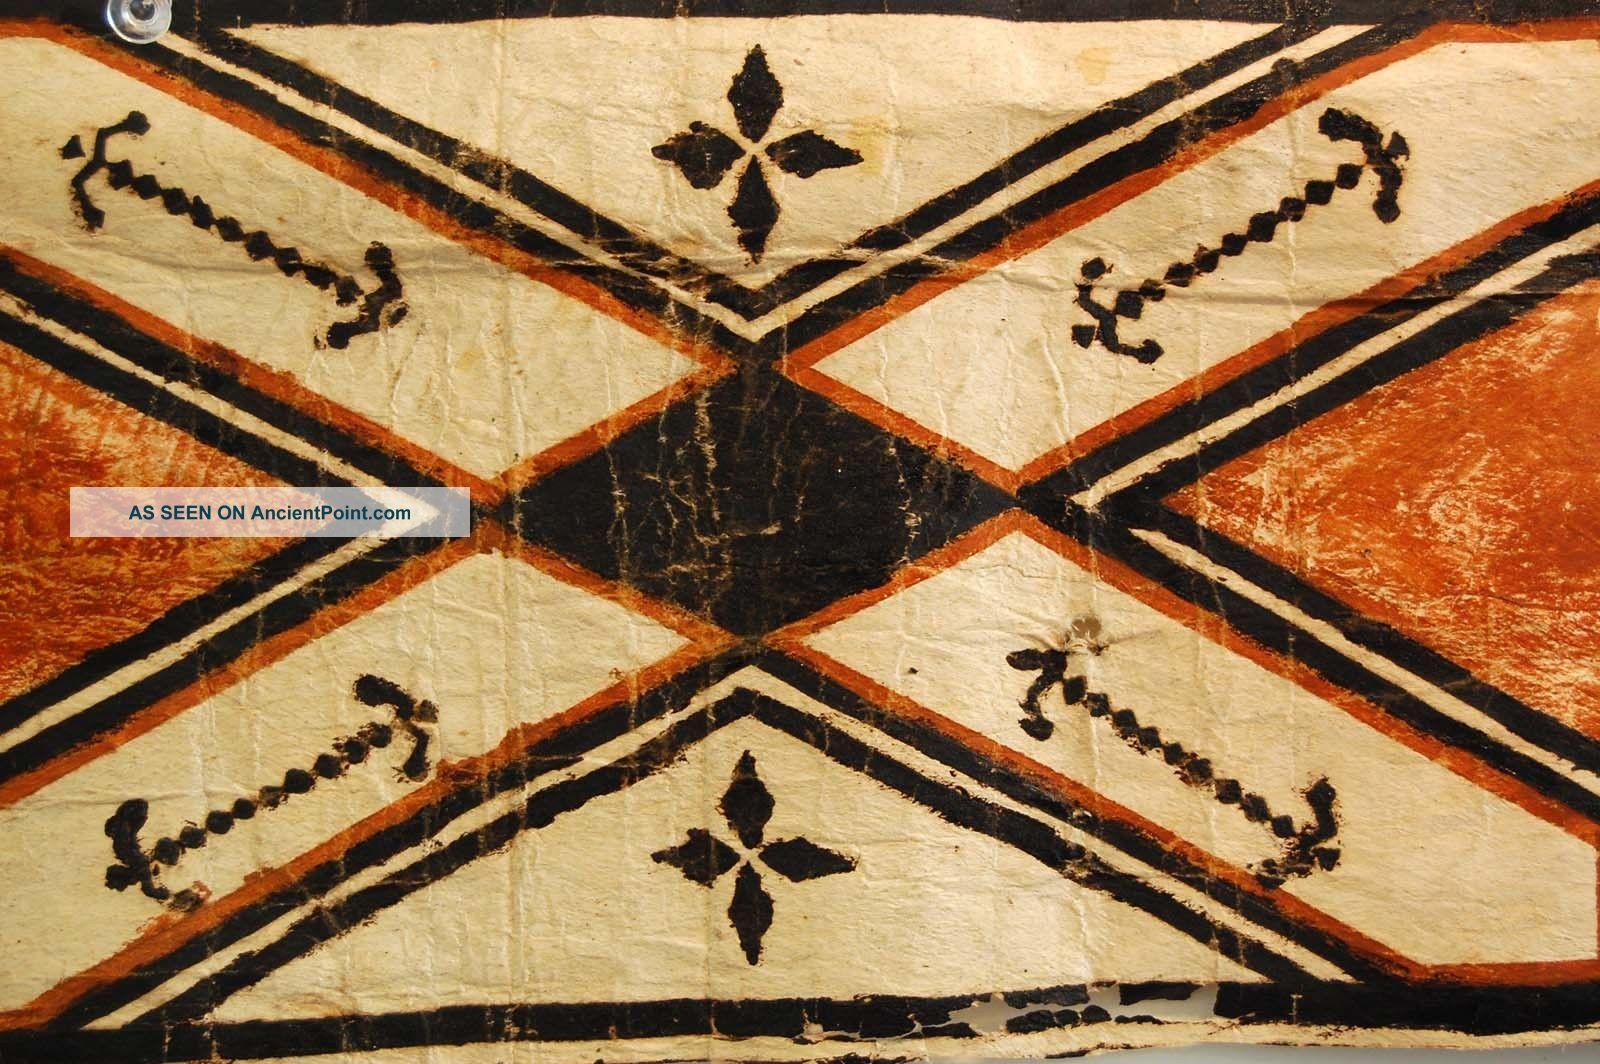 Oceanic Art Tapa Cloth Hawaiian Kapa Cloth Polynesian Bark Strip Painted Pacific Islands & Oceania photo